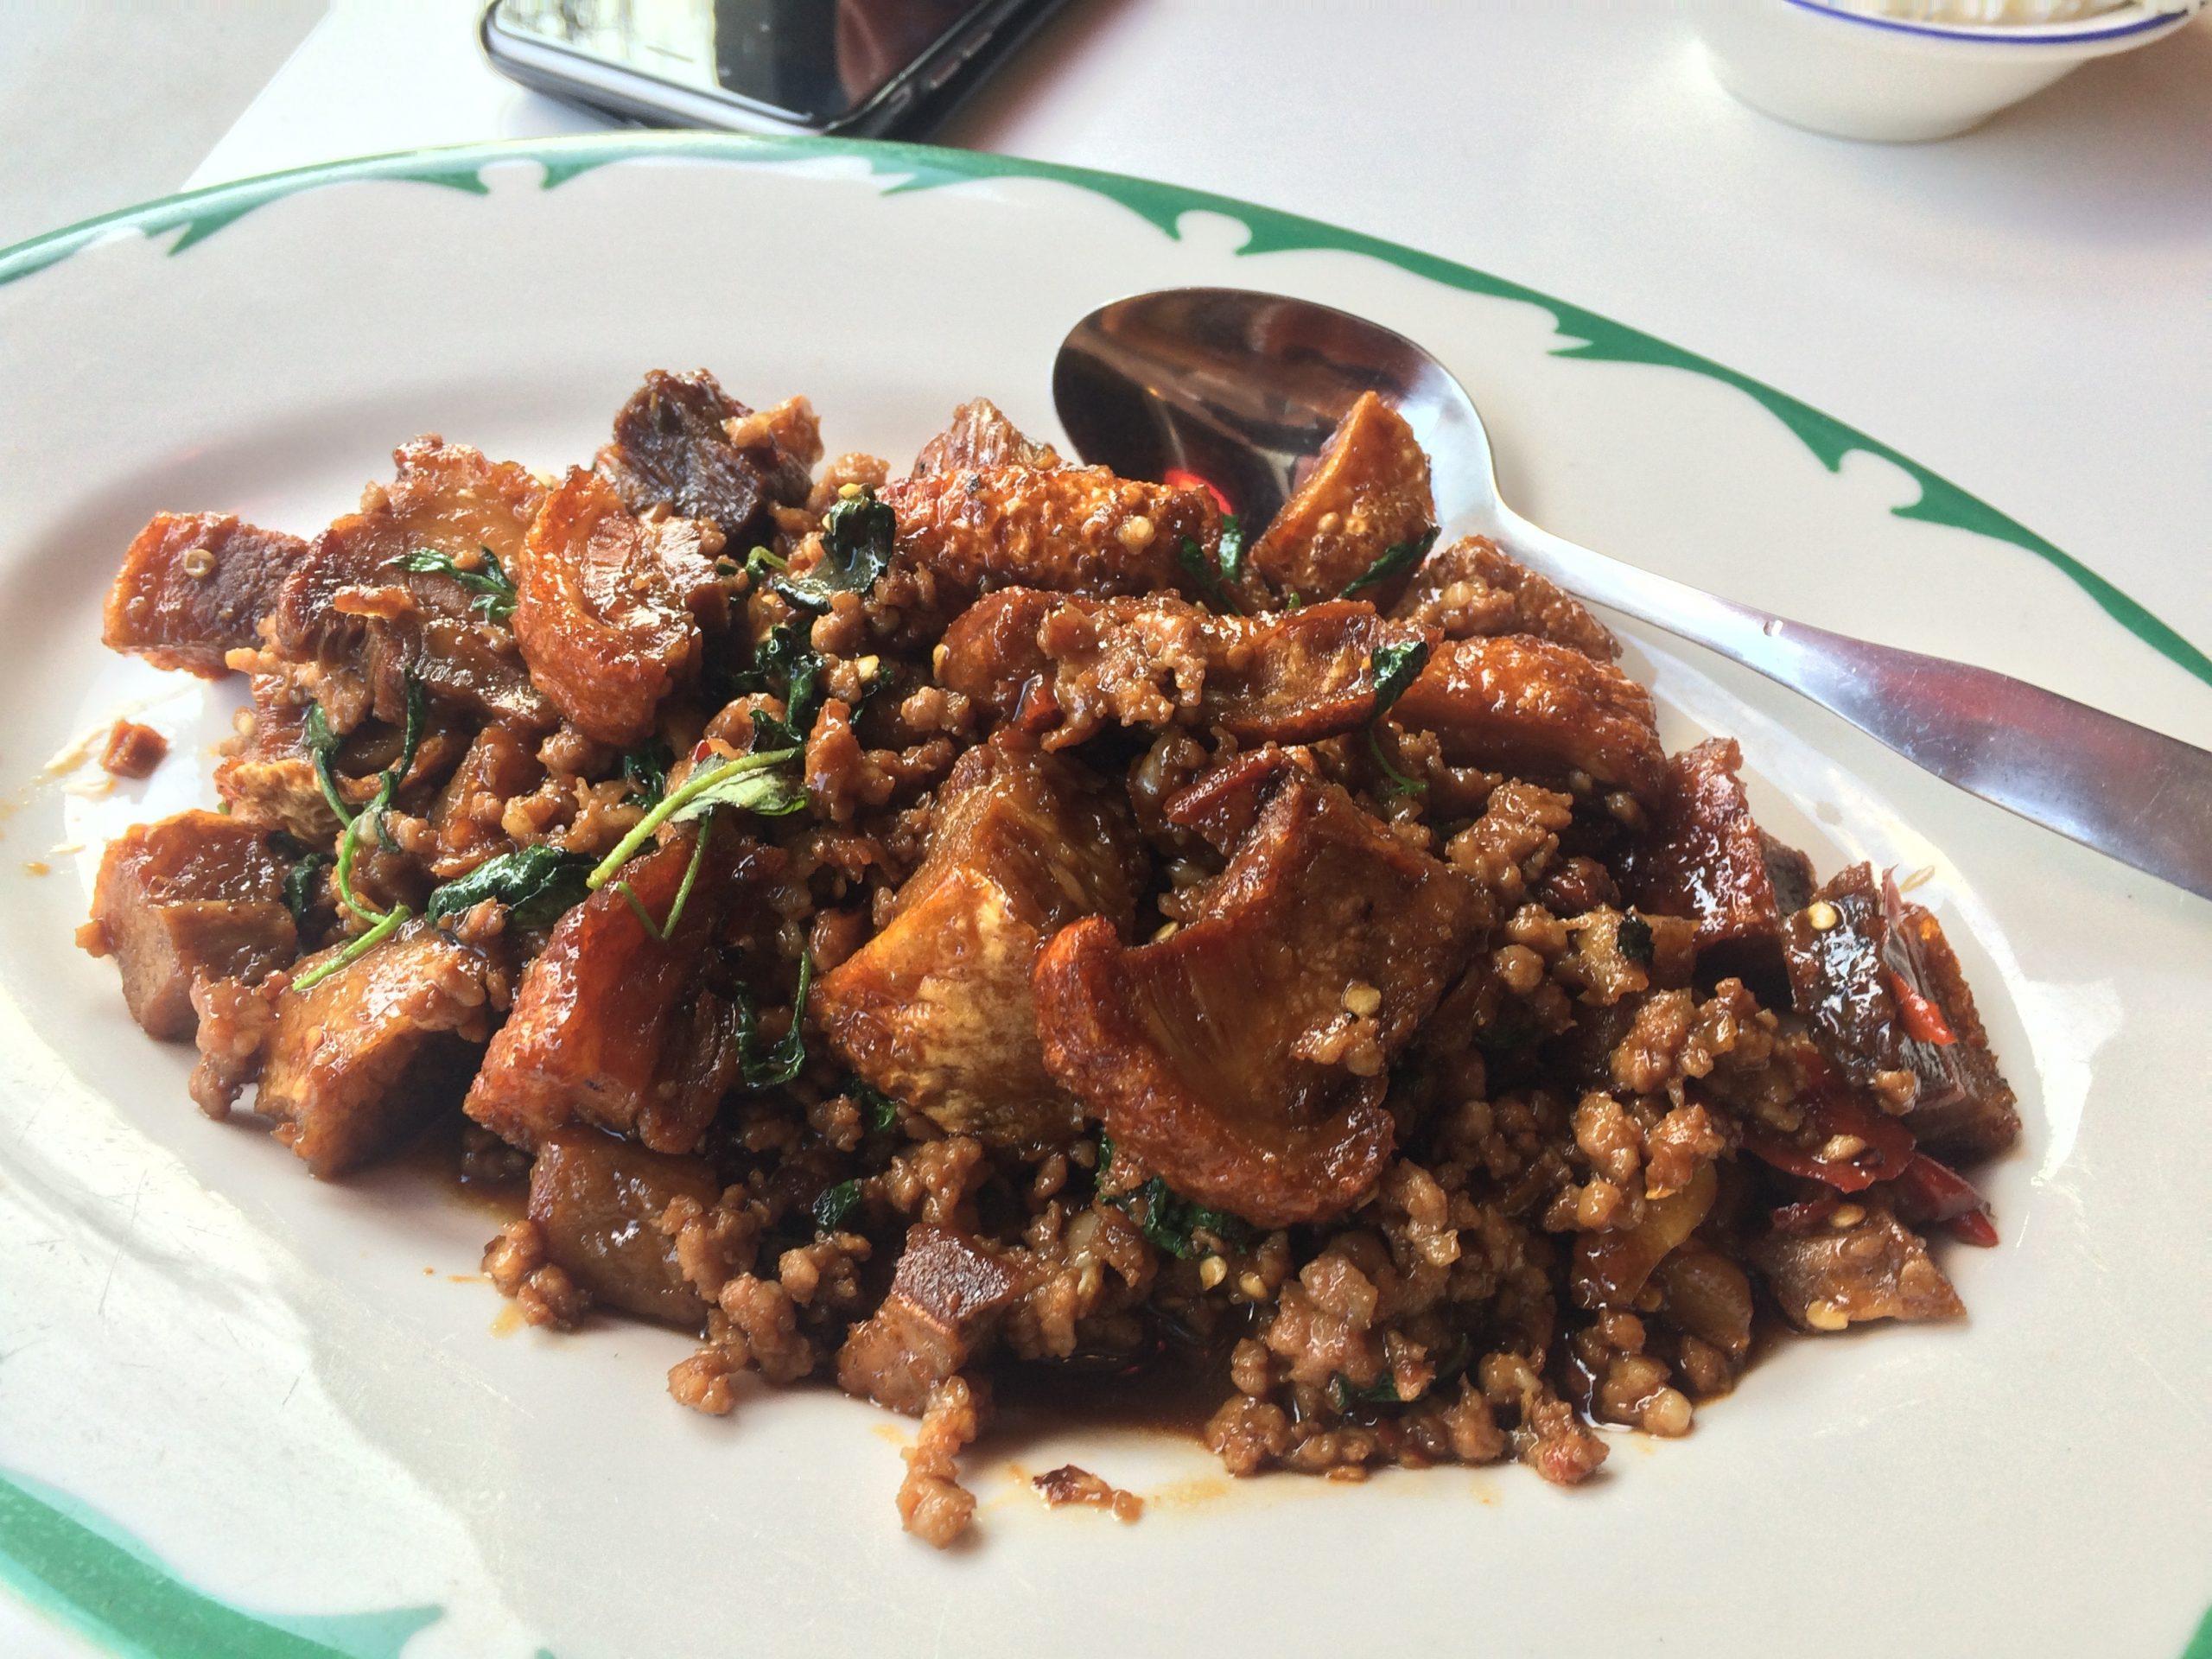 <i>Phat ka-phrao mu krop</i> (spicy basil stir-fry of crispy pork belly) at Tom Yum Cafe